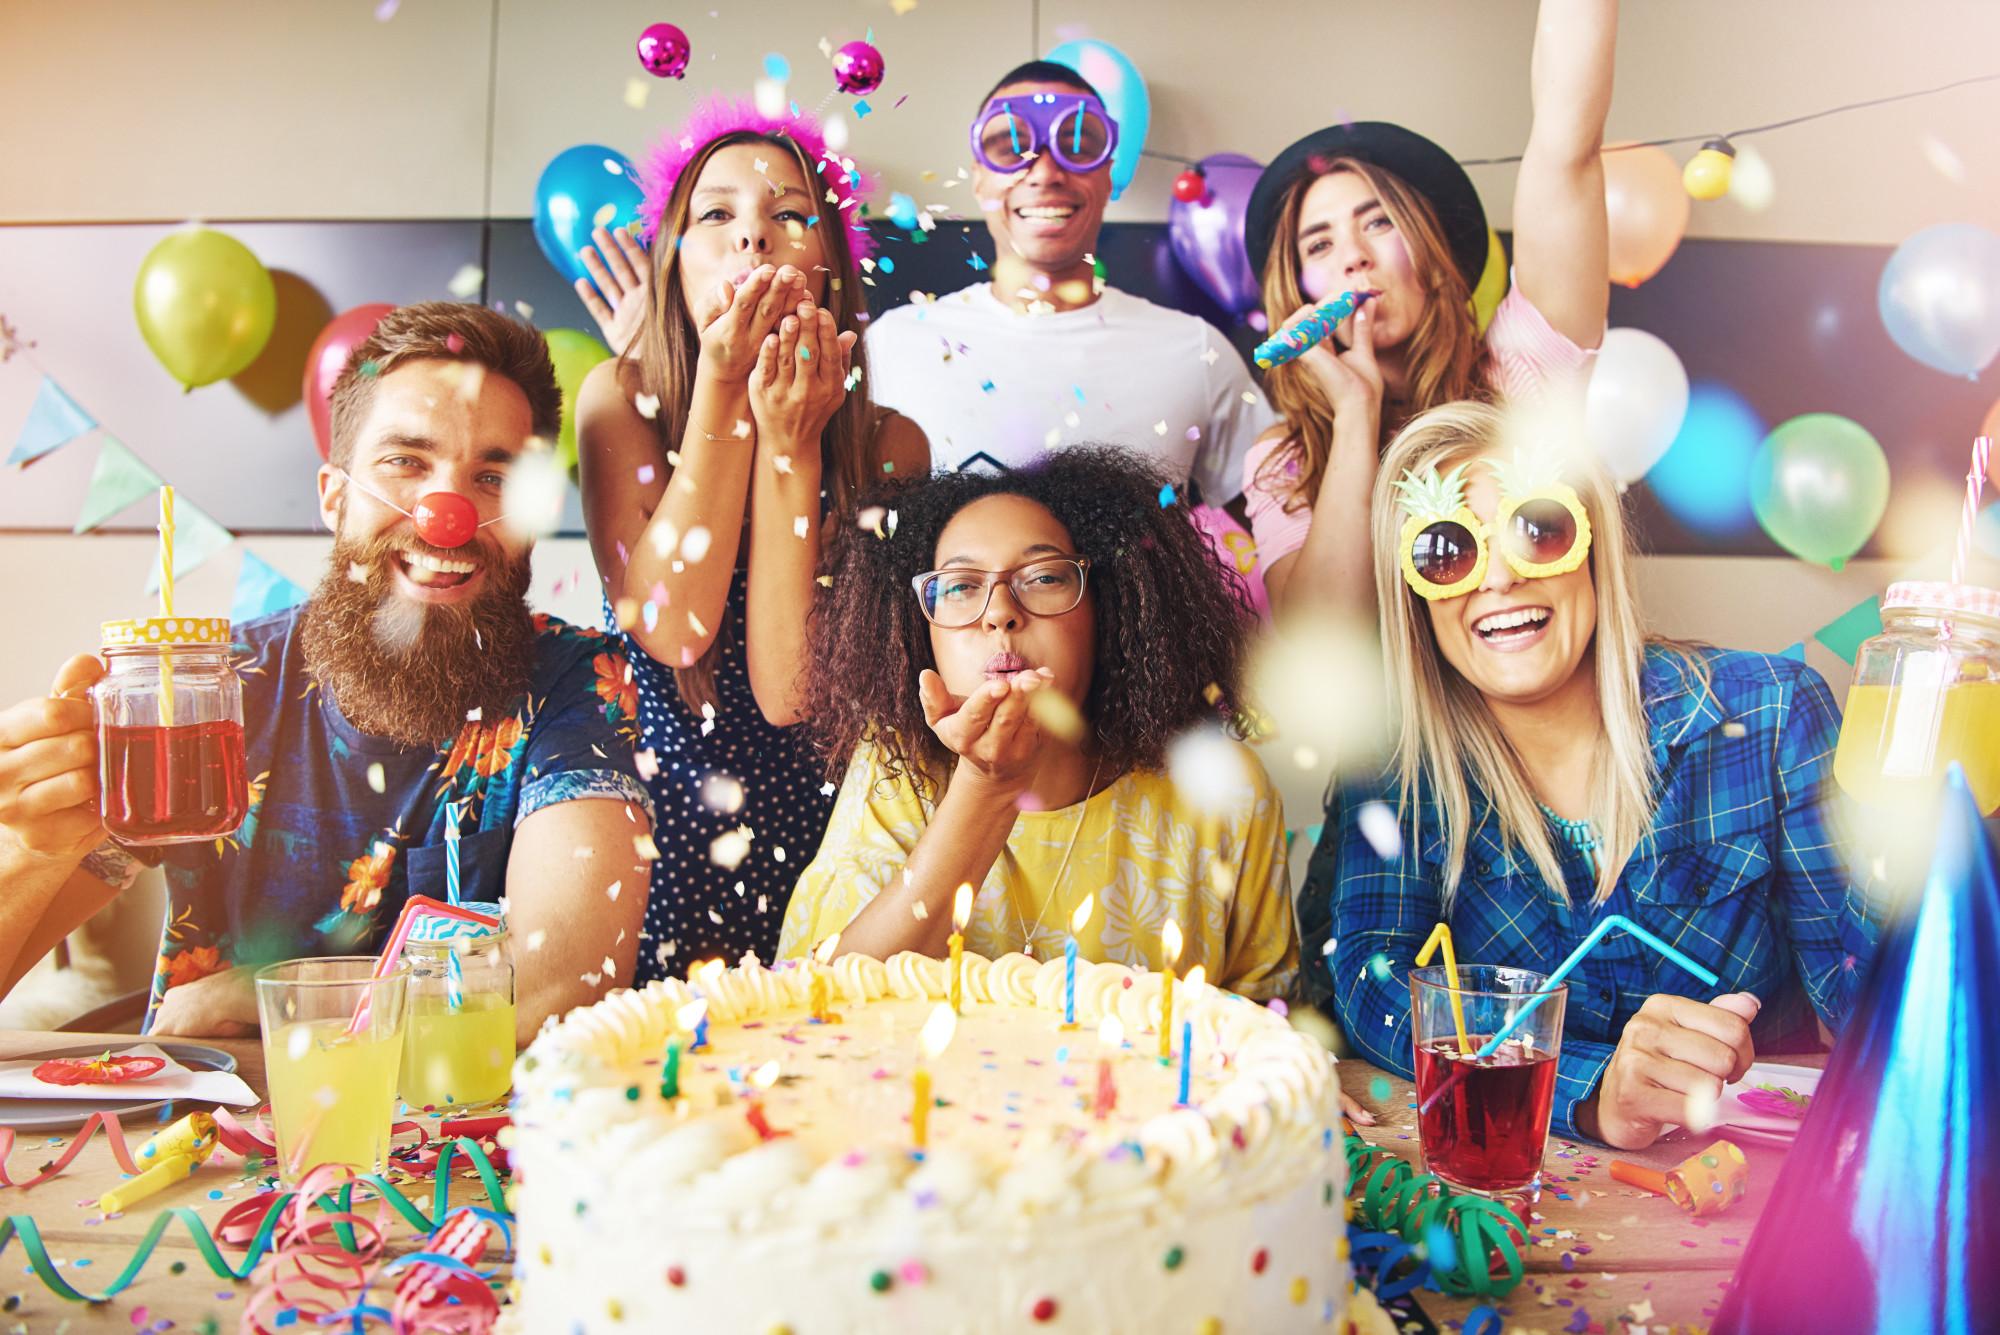 8 Extremely Fun Ways to Celebrate Your Birthday